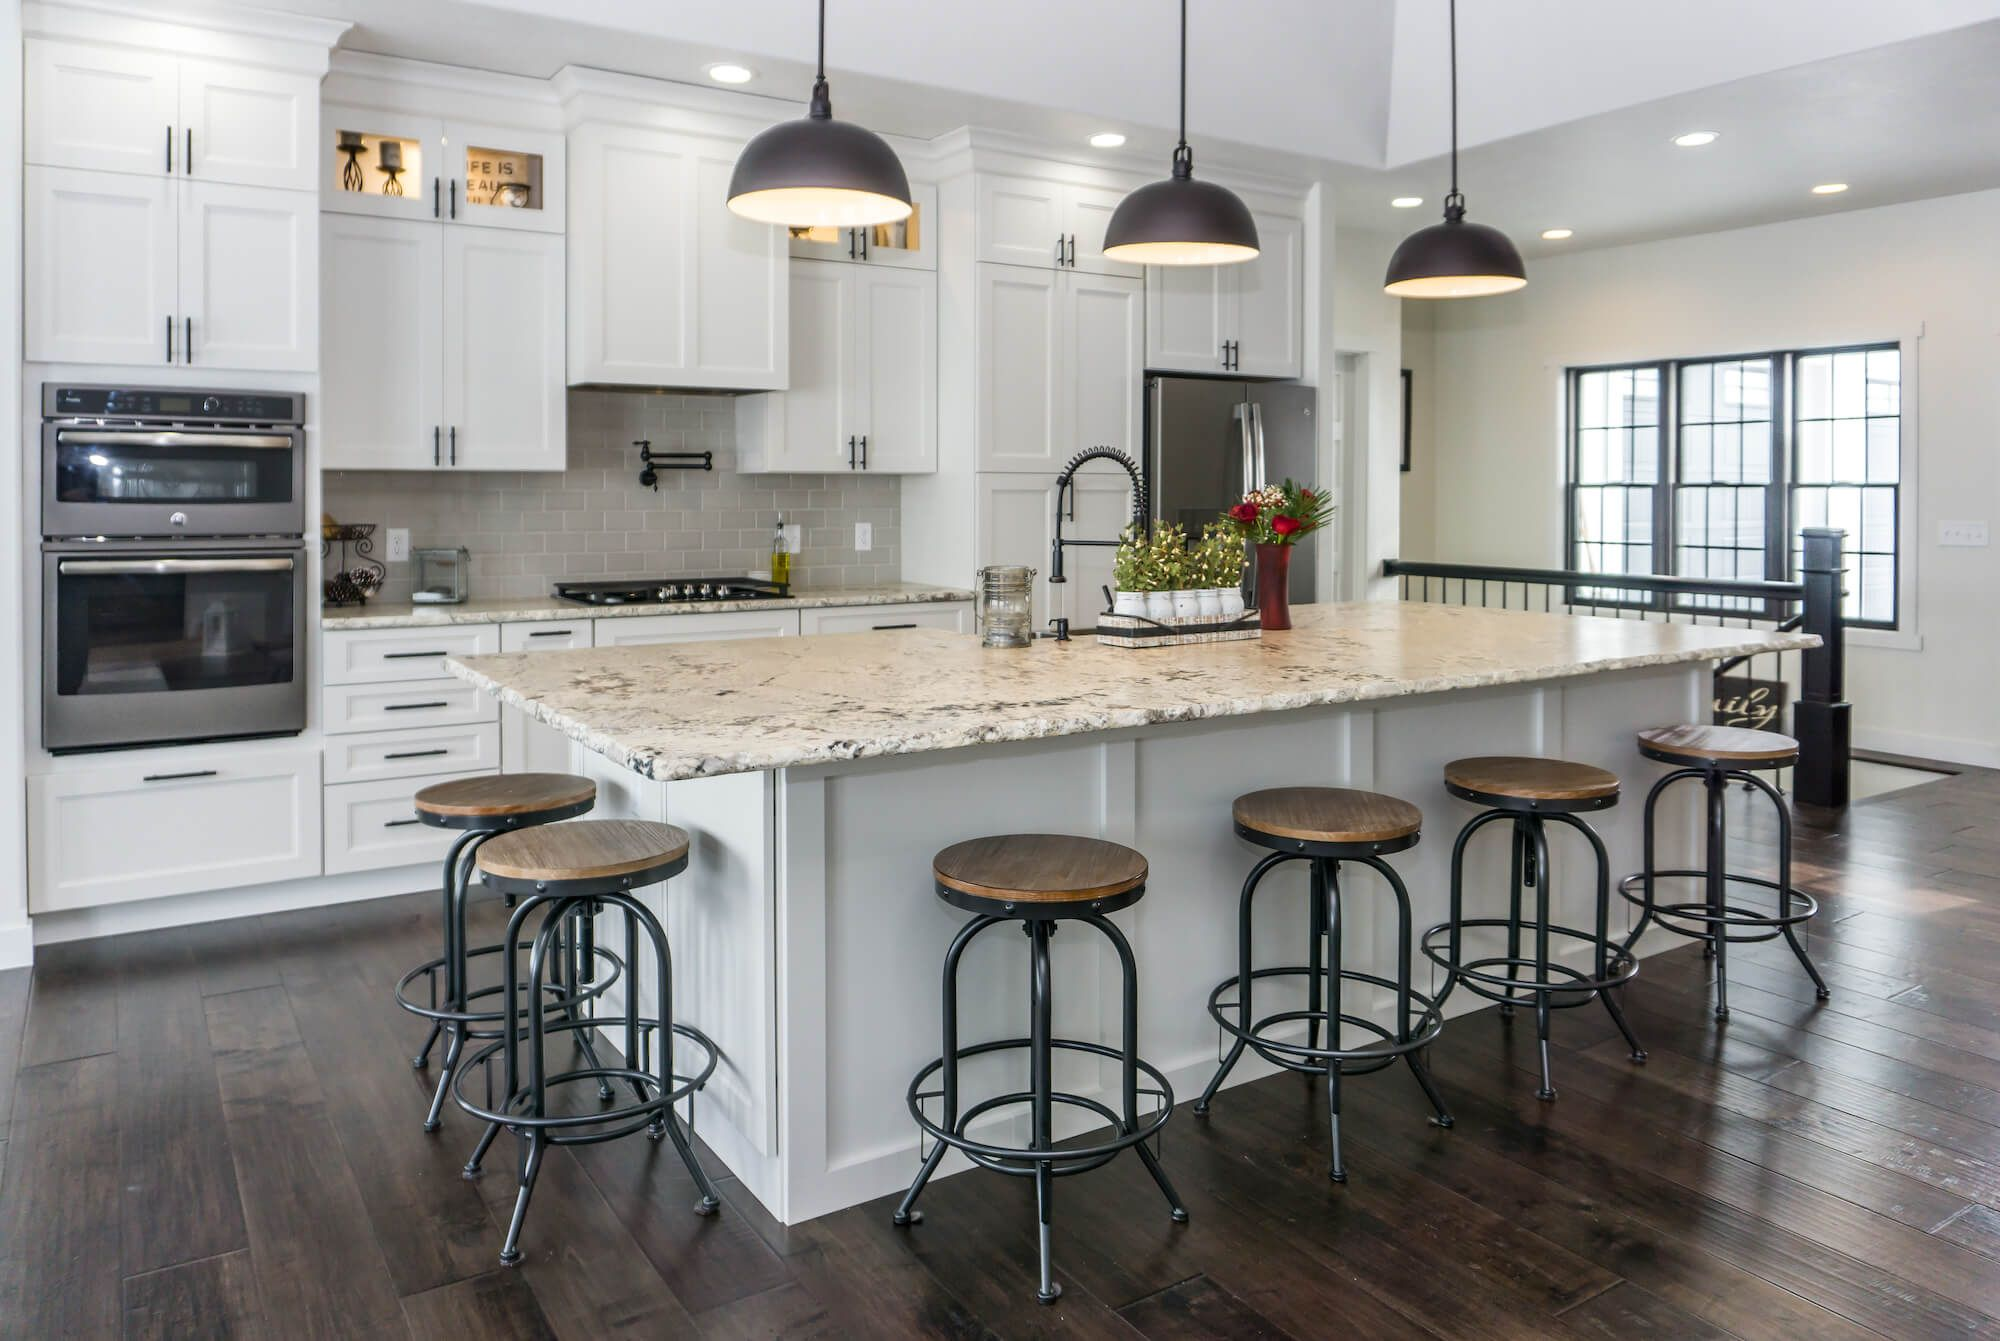 Kitchen Materials And Design By Builders Firstsource Of Pierre Builder Cornerstone Llc Kitchen Design Kitchen Builder Kitchen Remodel